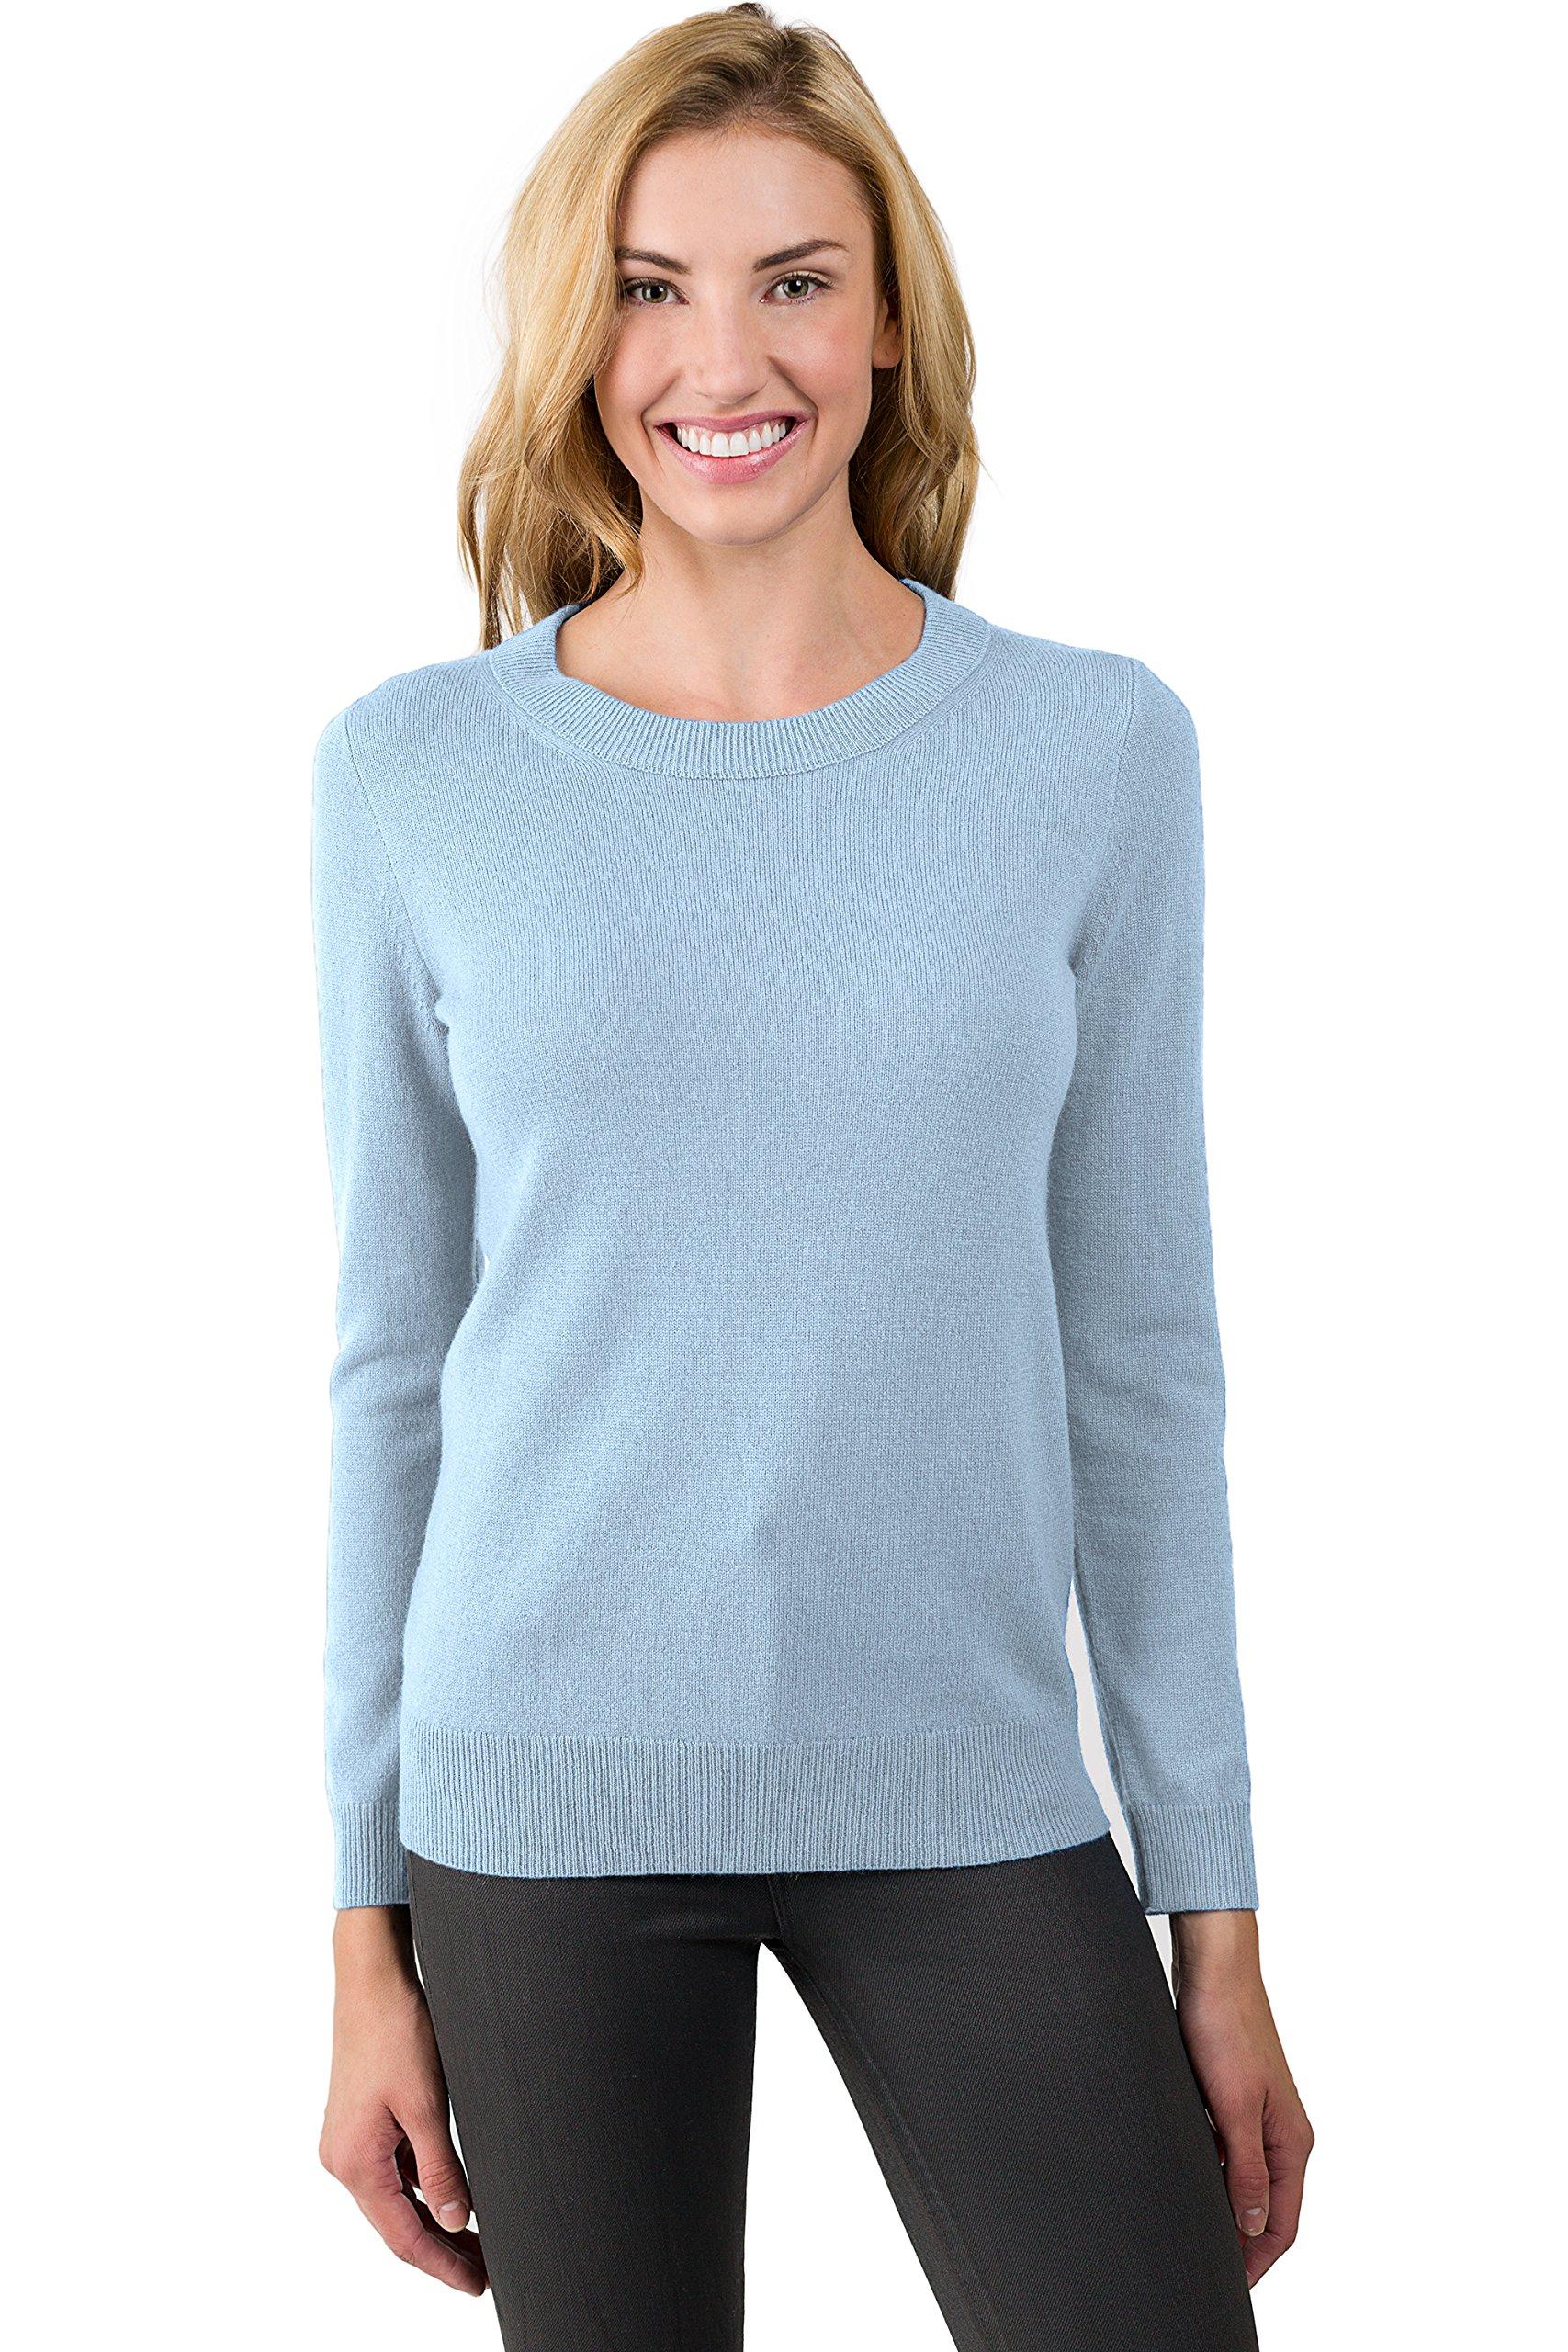 JENNIE LIU Women's 100% Pure Cashmere Long Sleeve Crew Neck Sweater (XL, Sky)